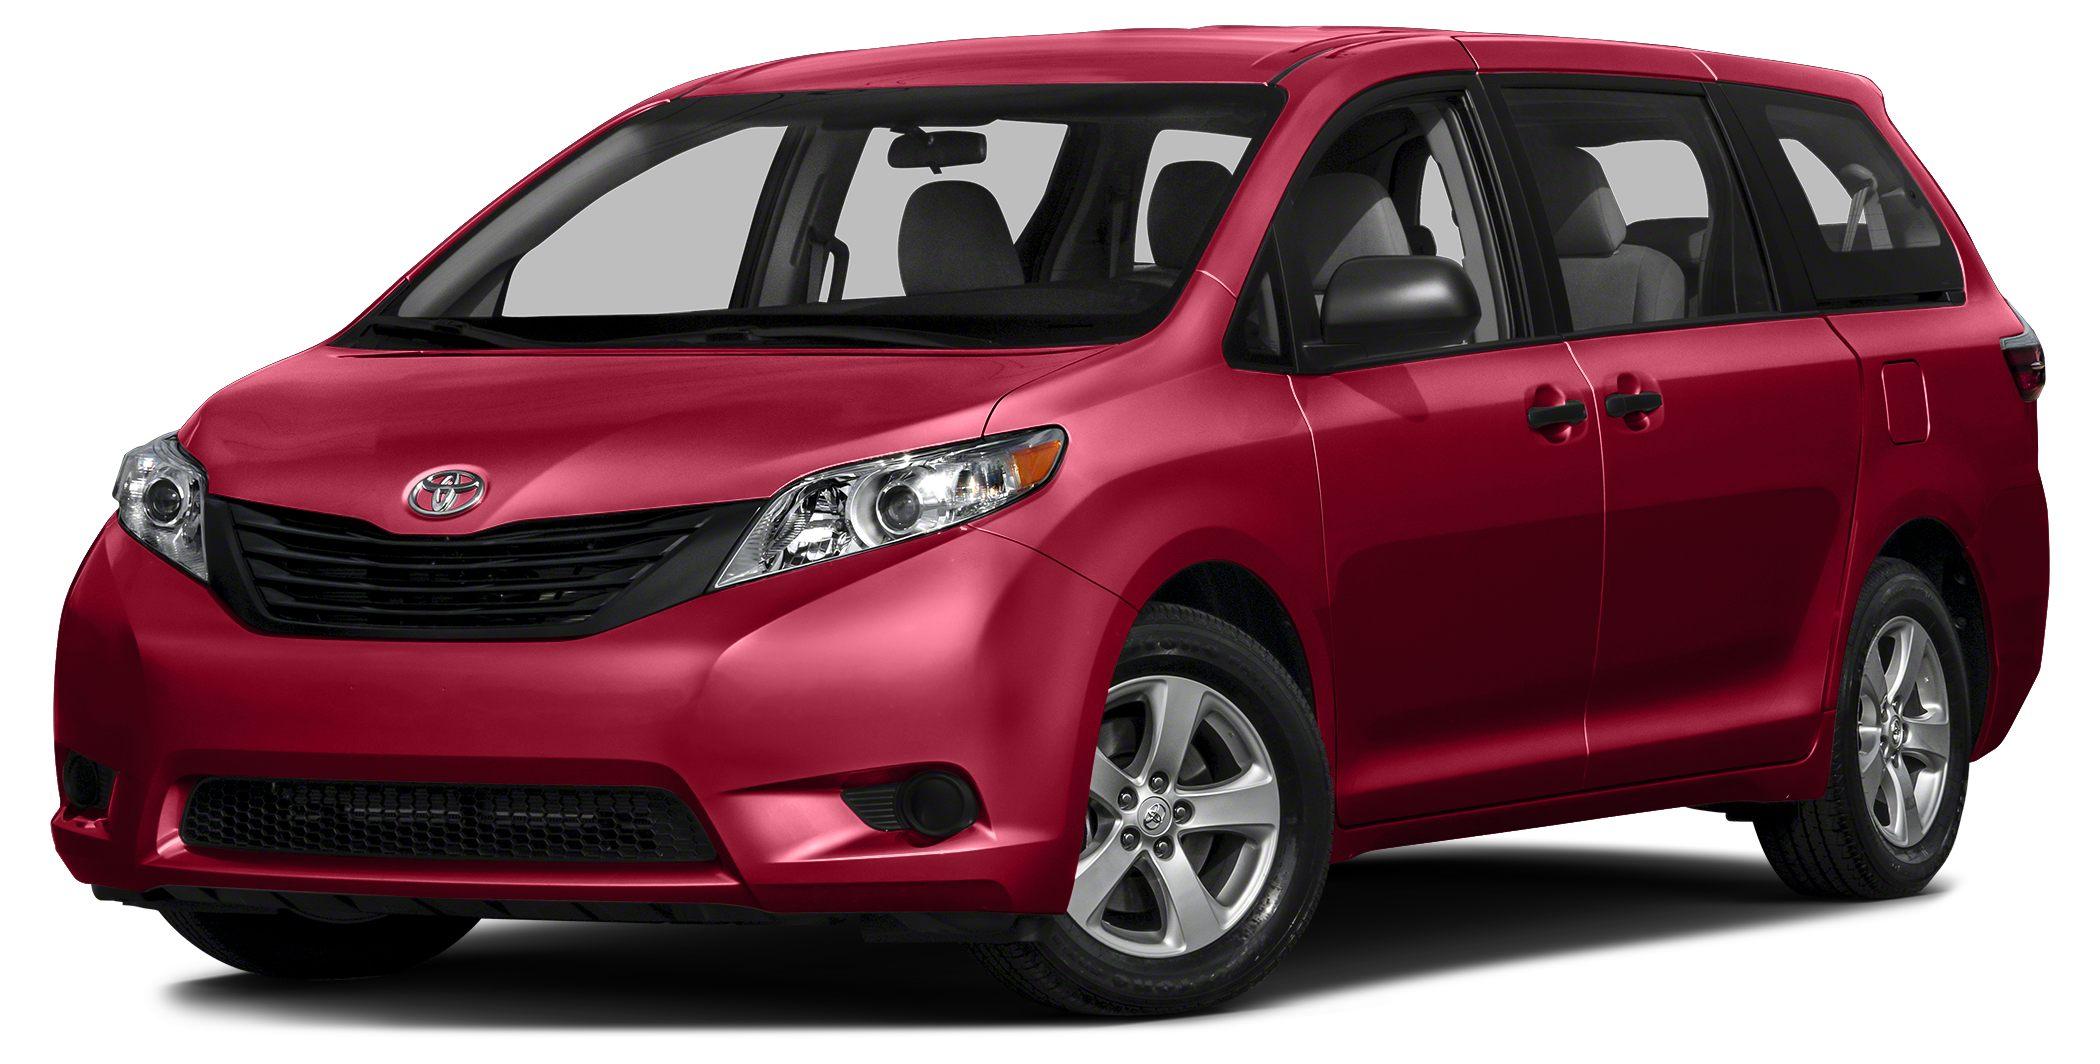 2015 Toyota Sienna Limited Premium 7 Passenger Heated Leather Seats Navigation DVD Entertainment